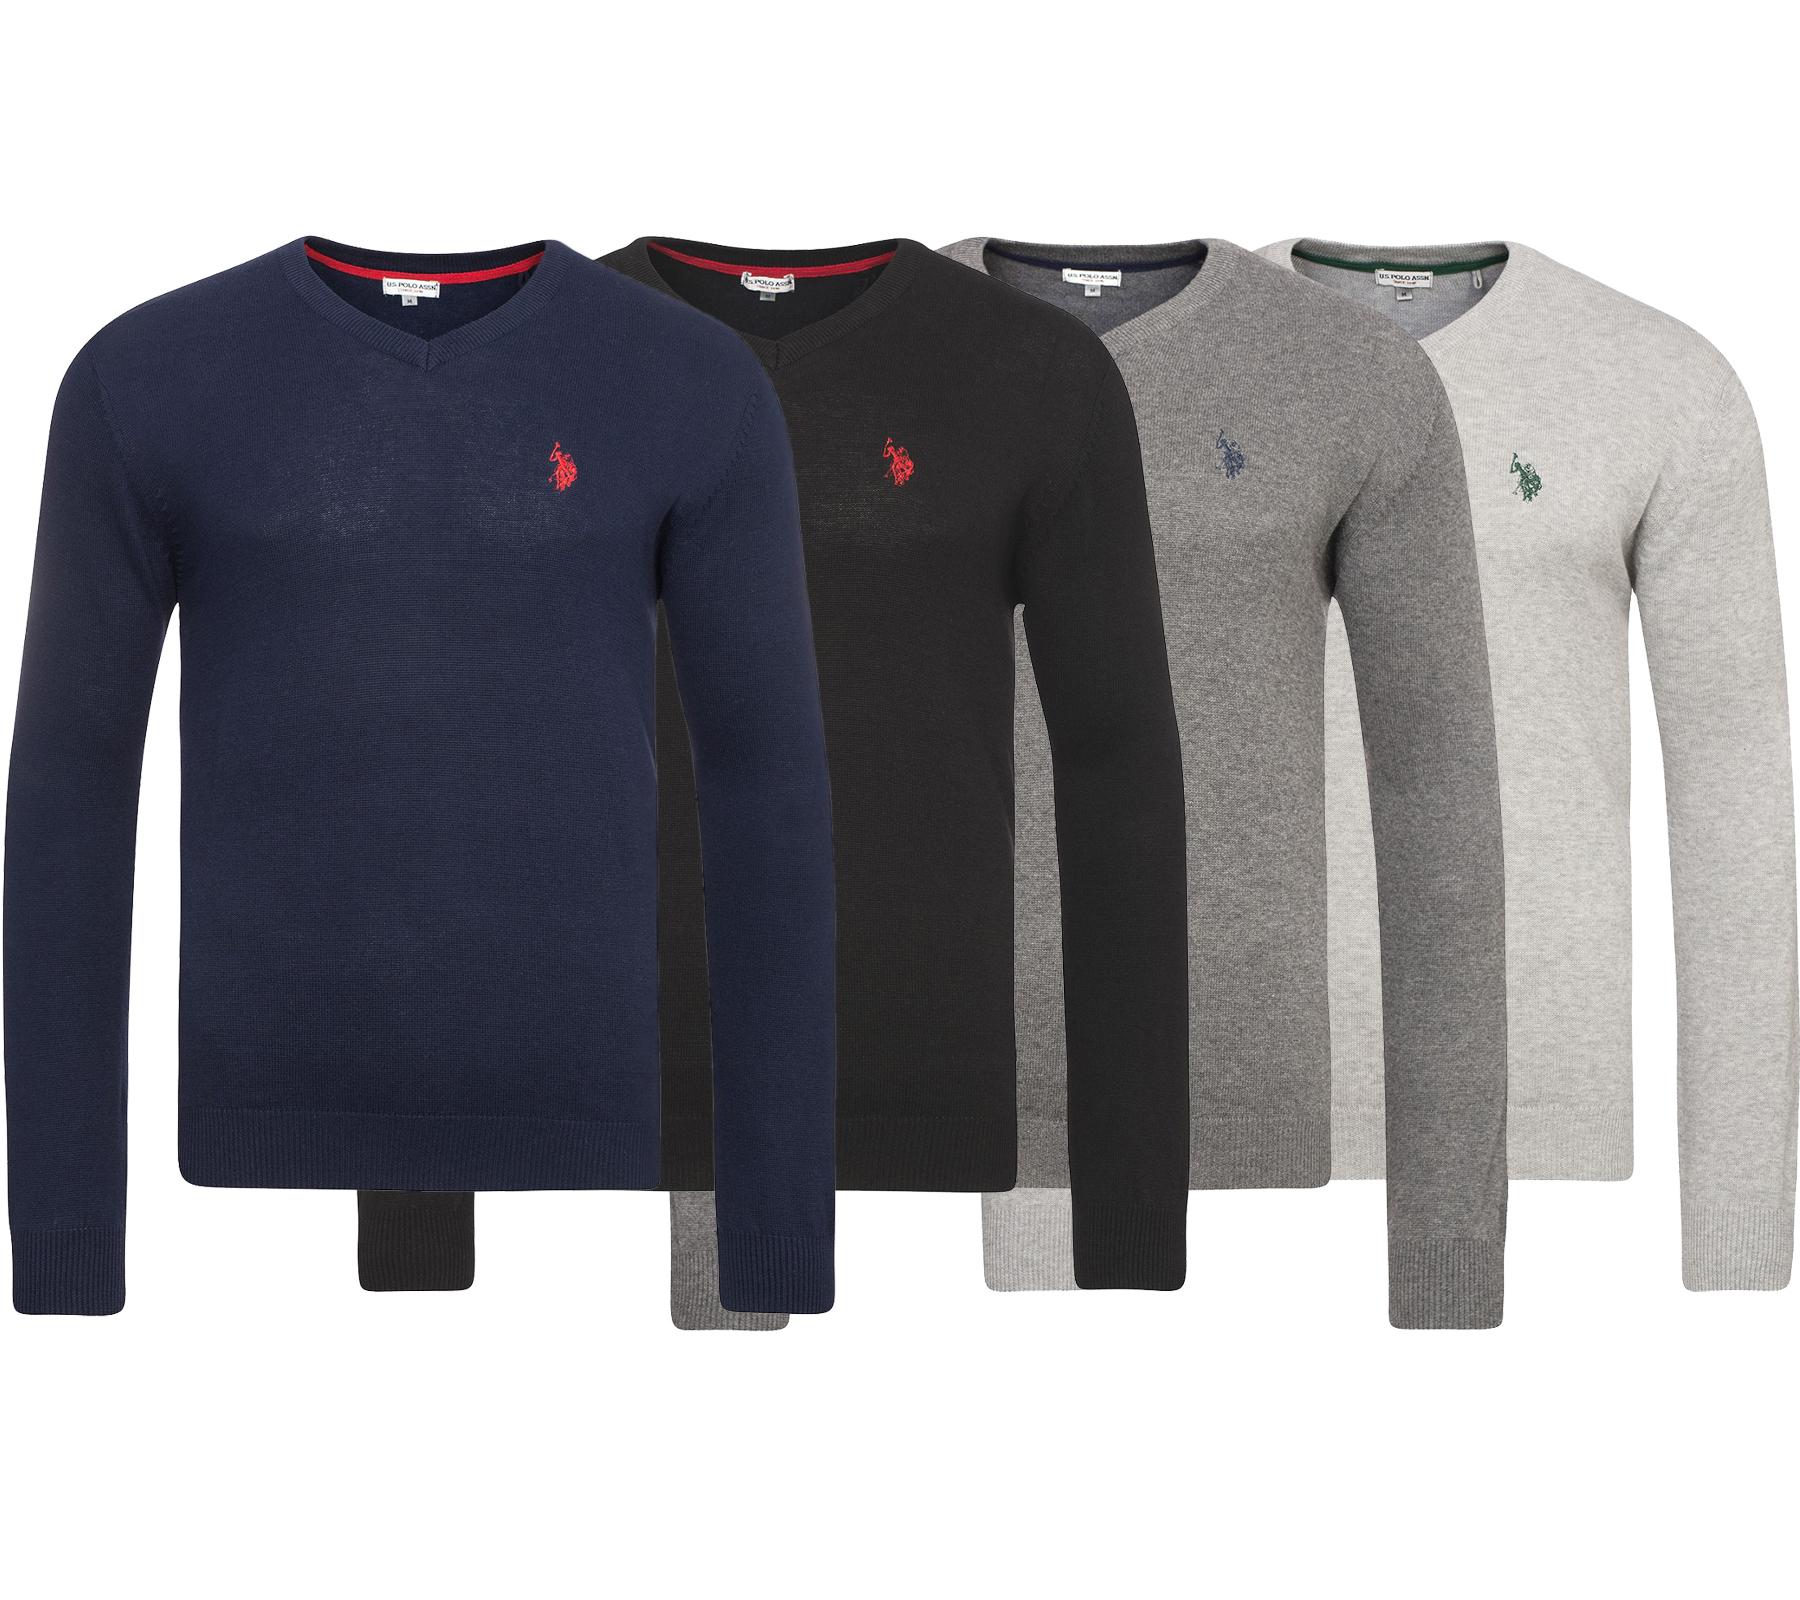 [@outlet46] U.S. Polo Assn. V-Neck Herren Pullover in verschied. Farben